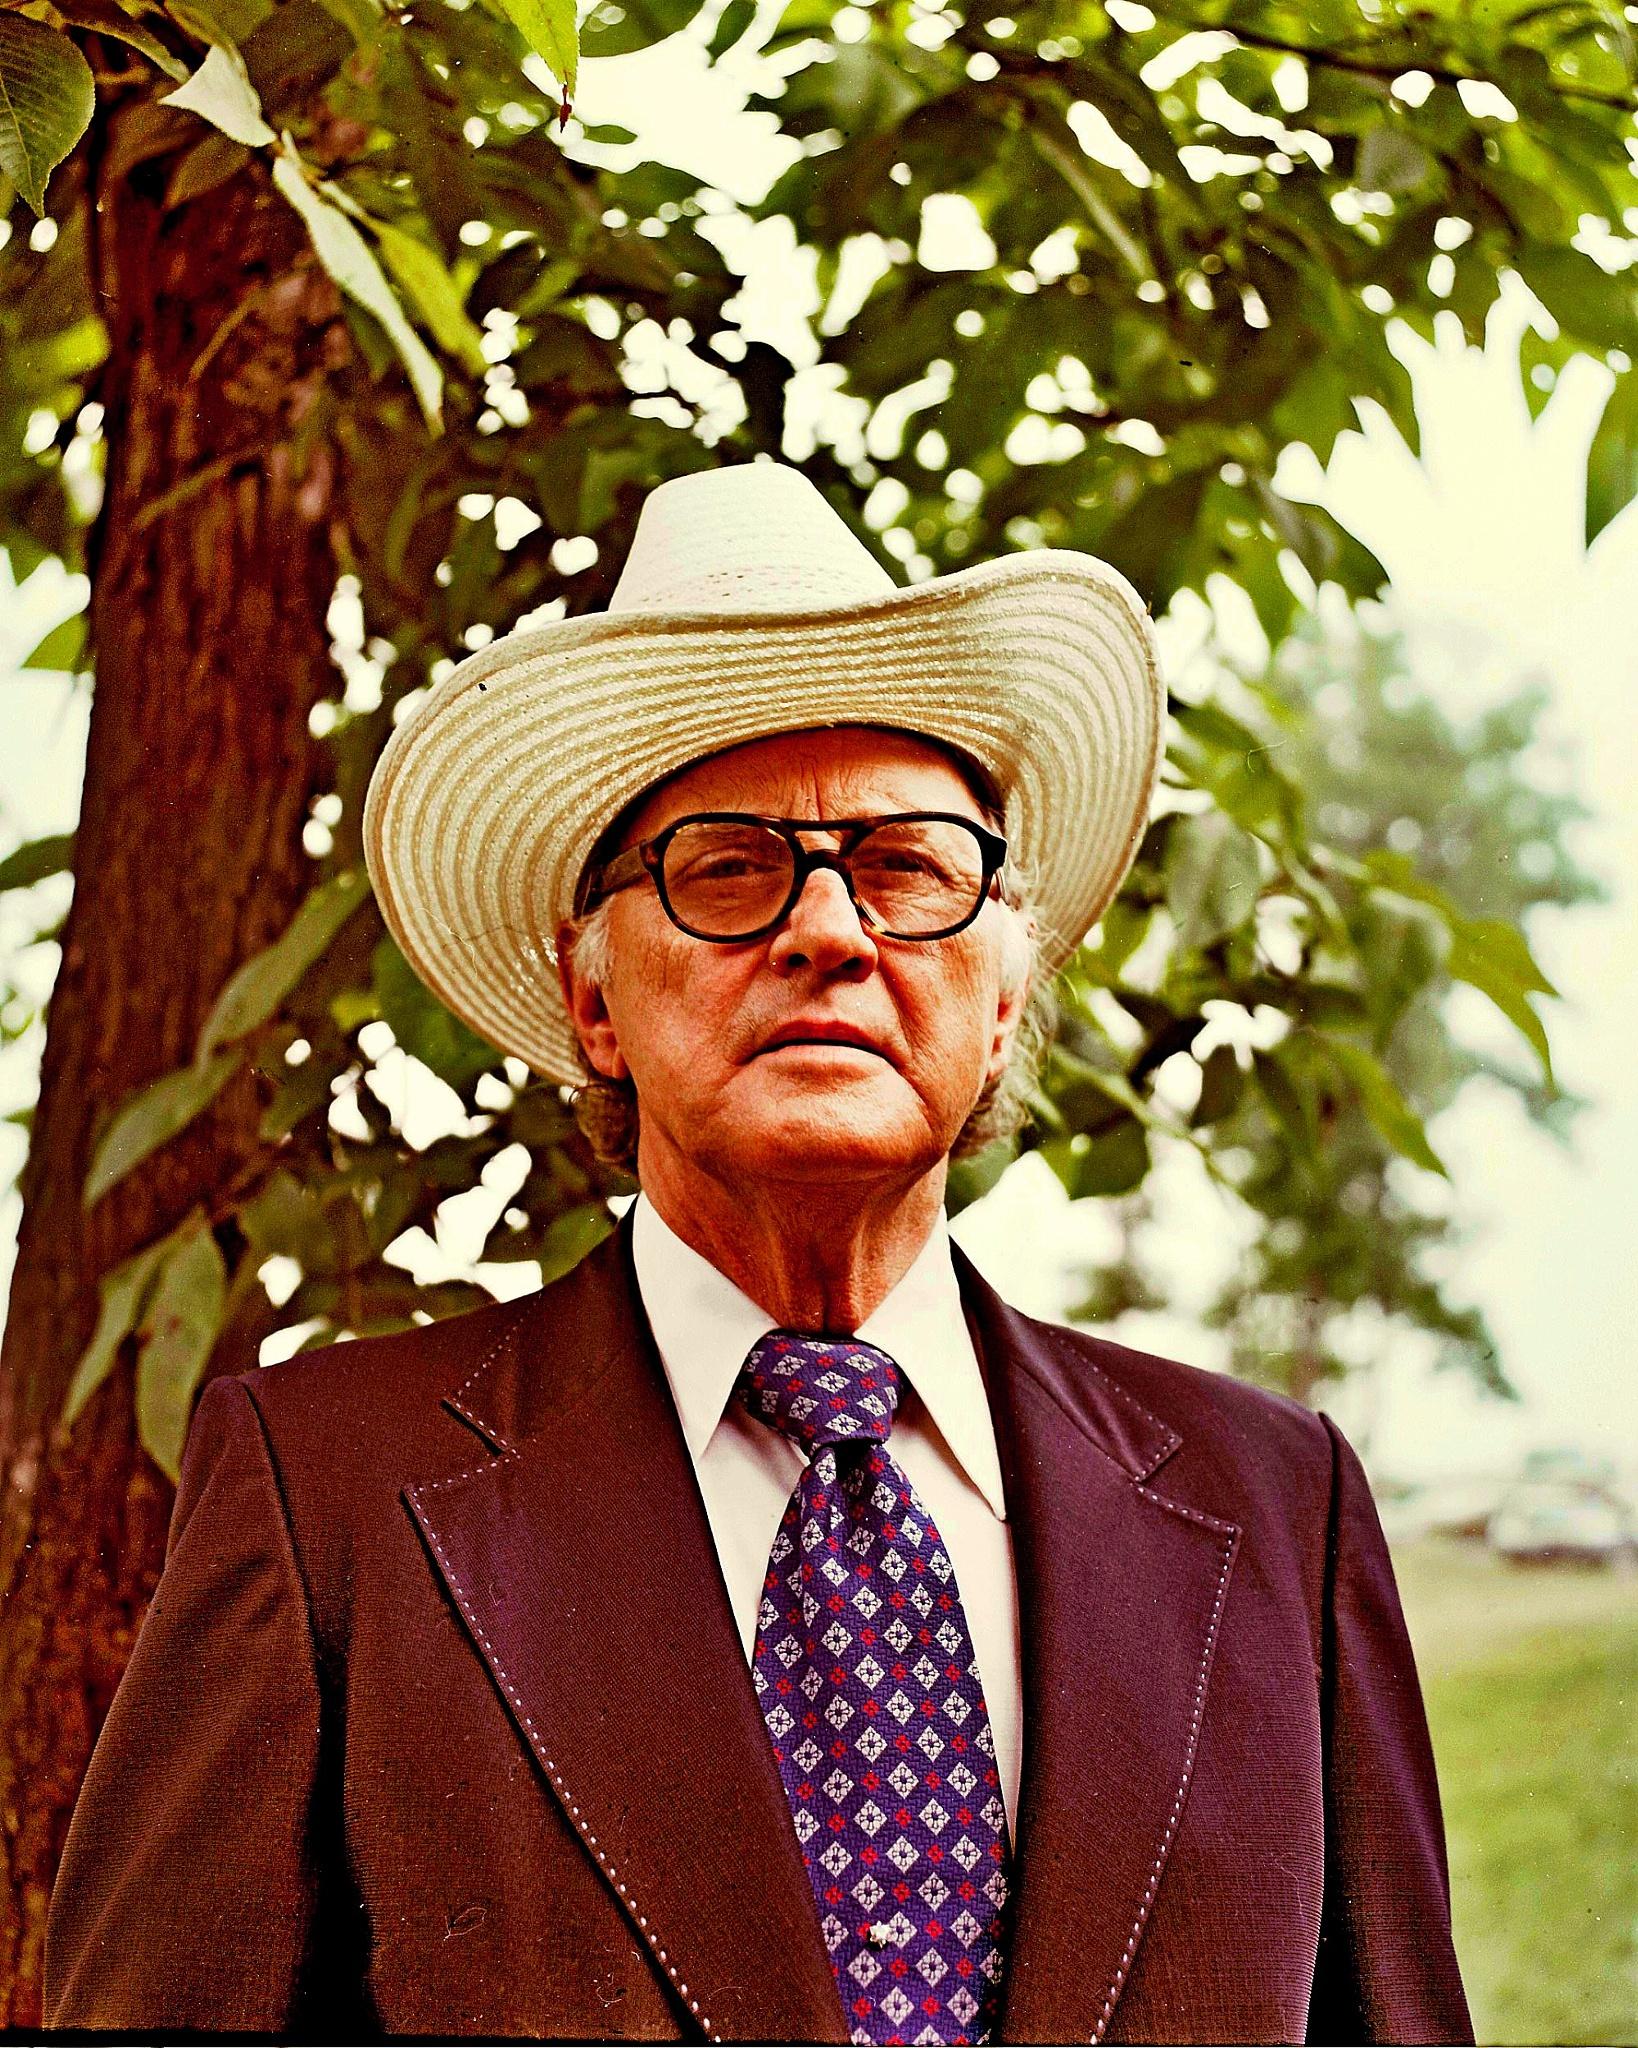 Bill Monroe, Ohio National Bluegrass Festival, 1970's by Wayne T. 'tom' Helfrich